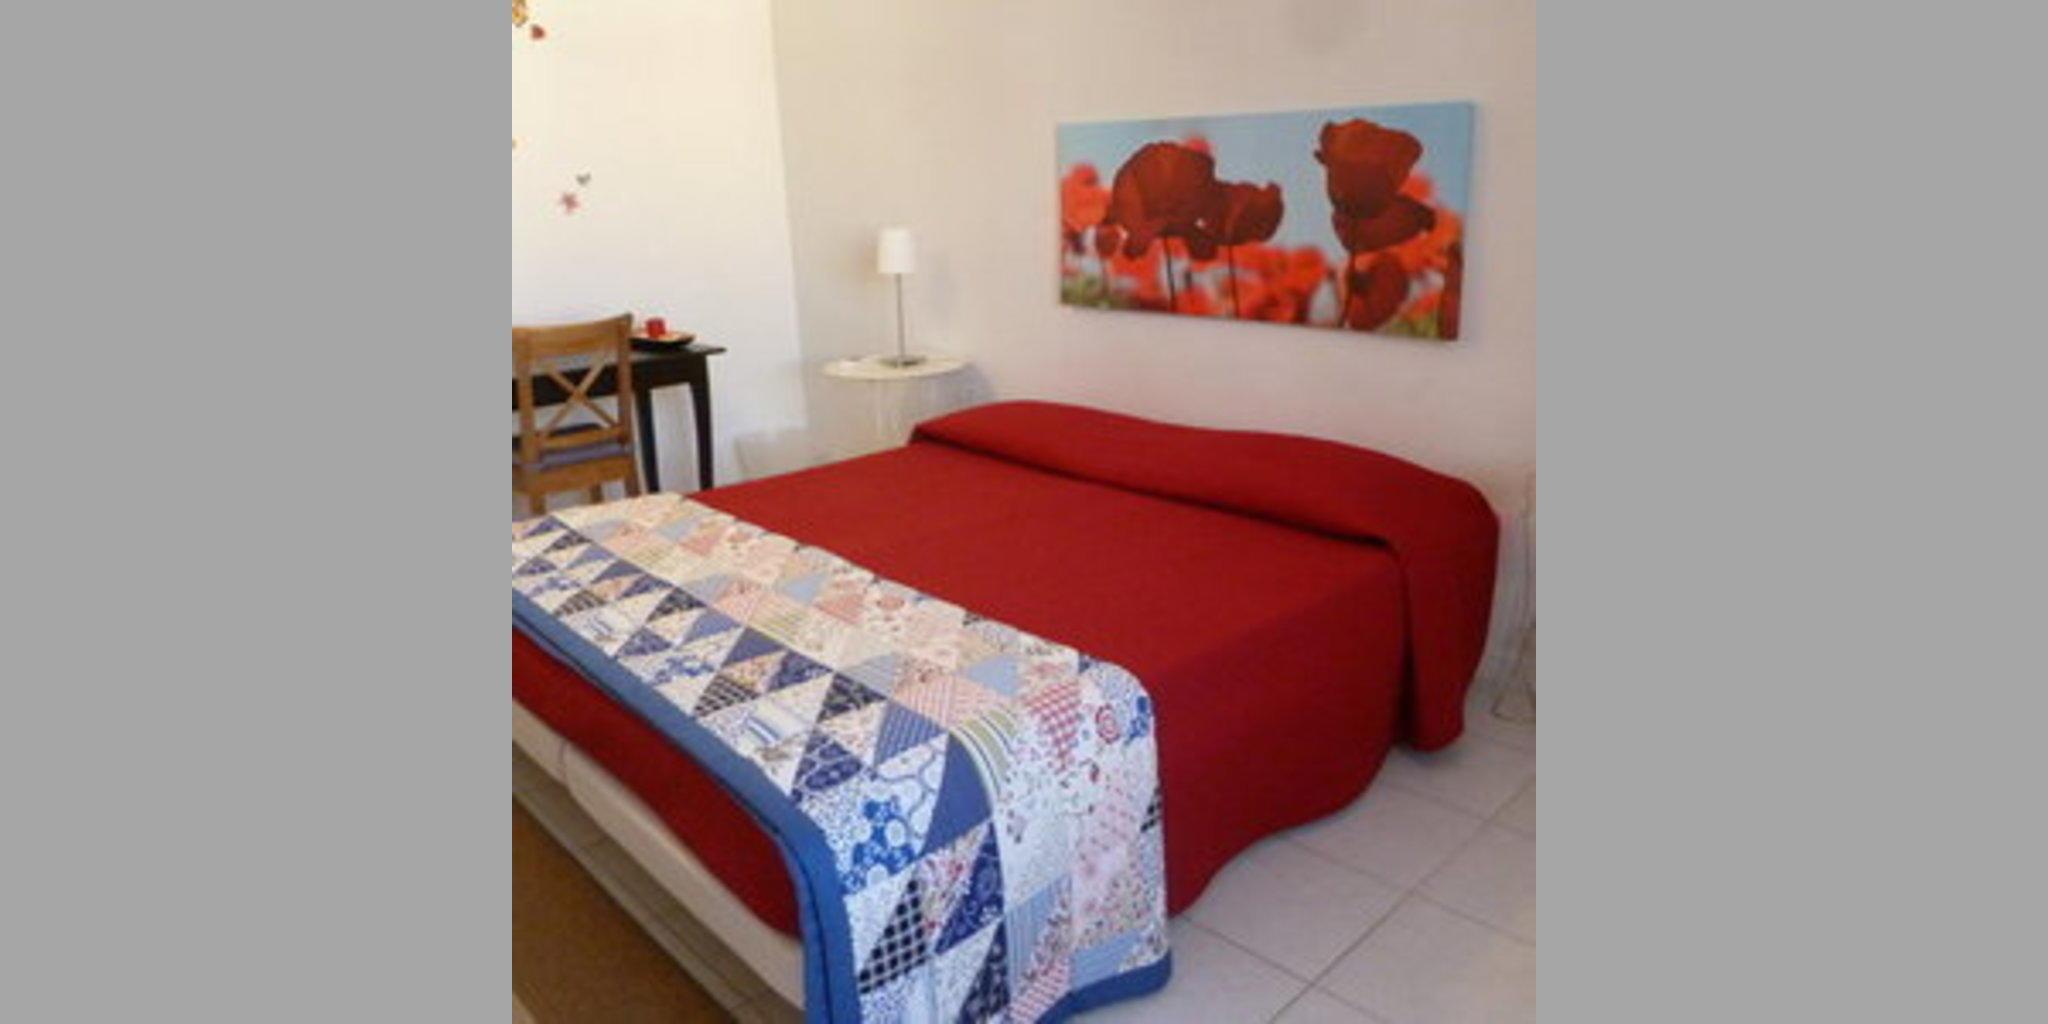 Bed and breakfast puglia offerte b b puglia - Mobili per bed and breakfast ...